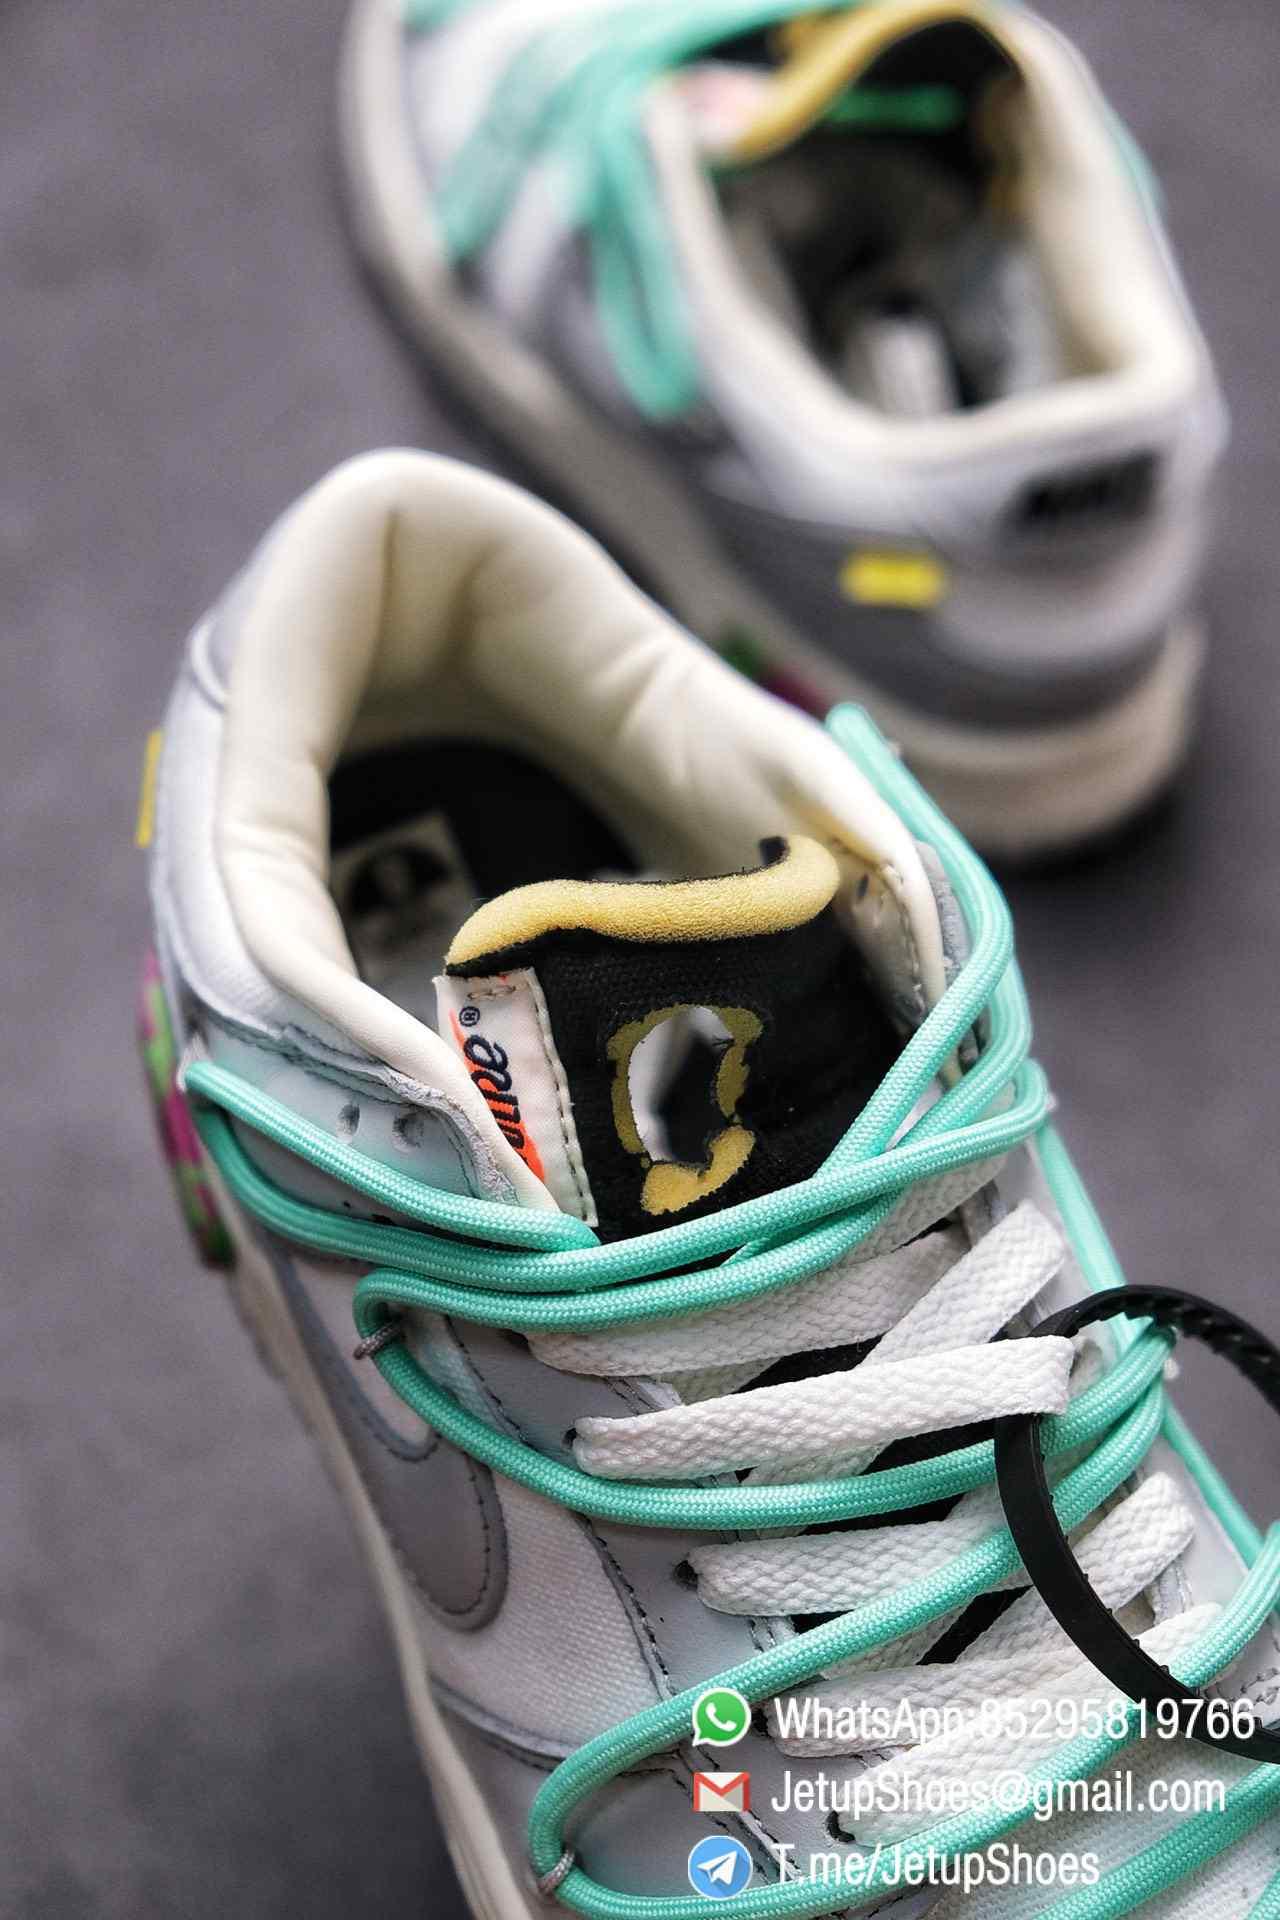 Best Replica Nike Sneakers 0ff White x Nike Dunk Low 04 of 50 SKU DM1602 114 Top RepSneakers Supplier 05